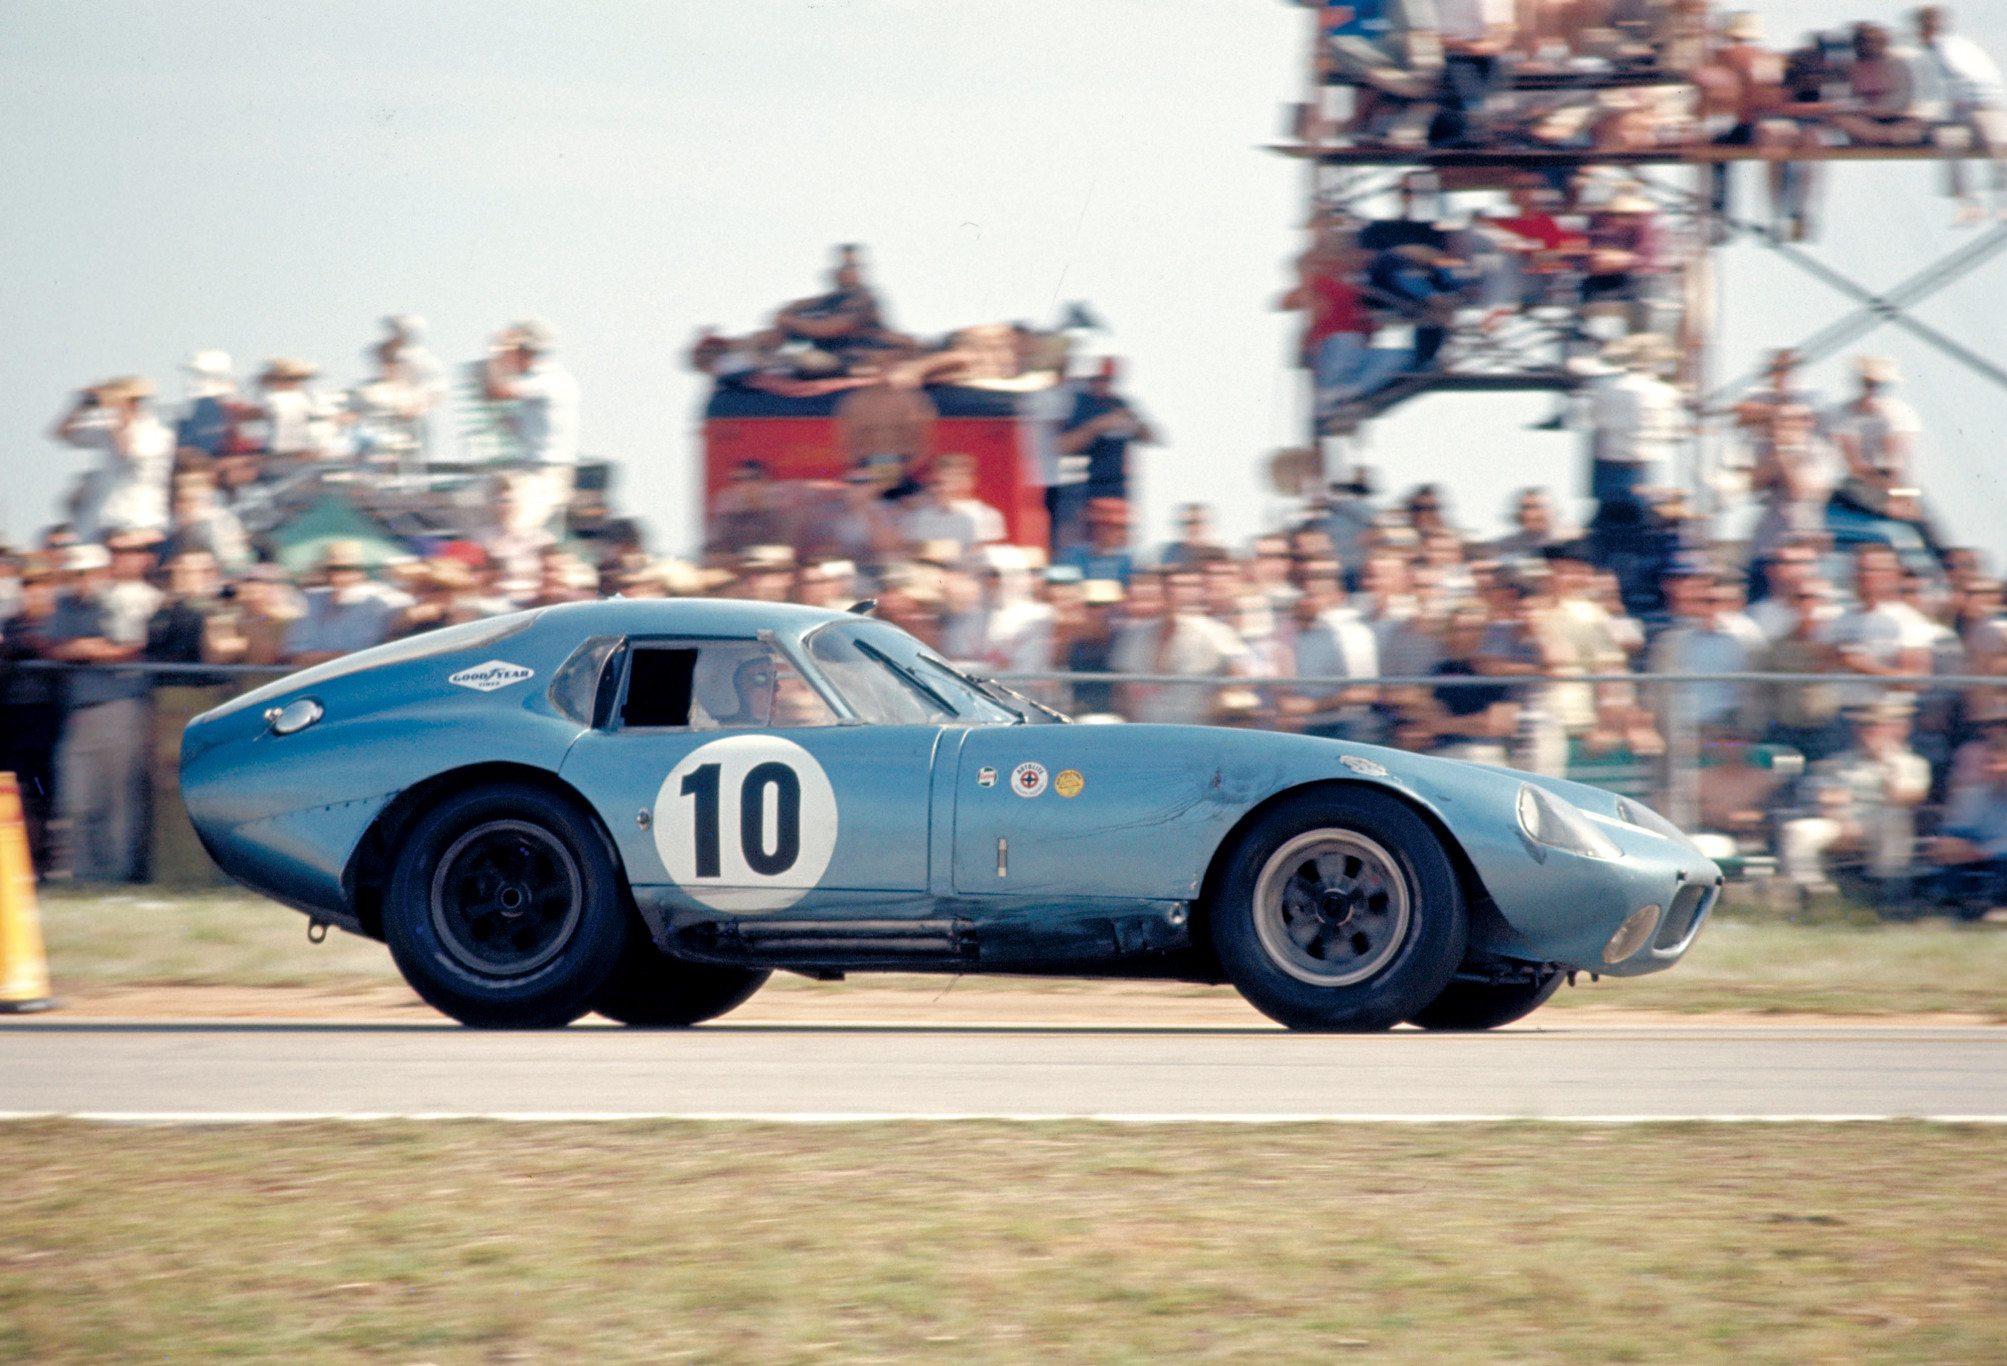 Shelby Daytona Coupe at FIA GT Race Ford Archive